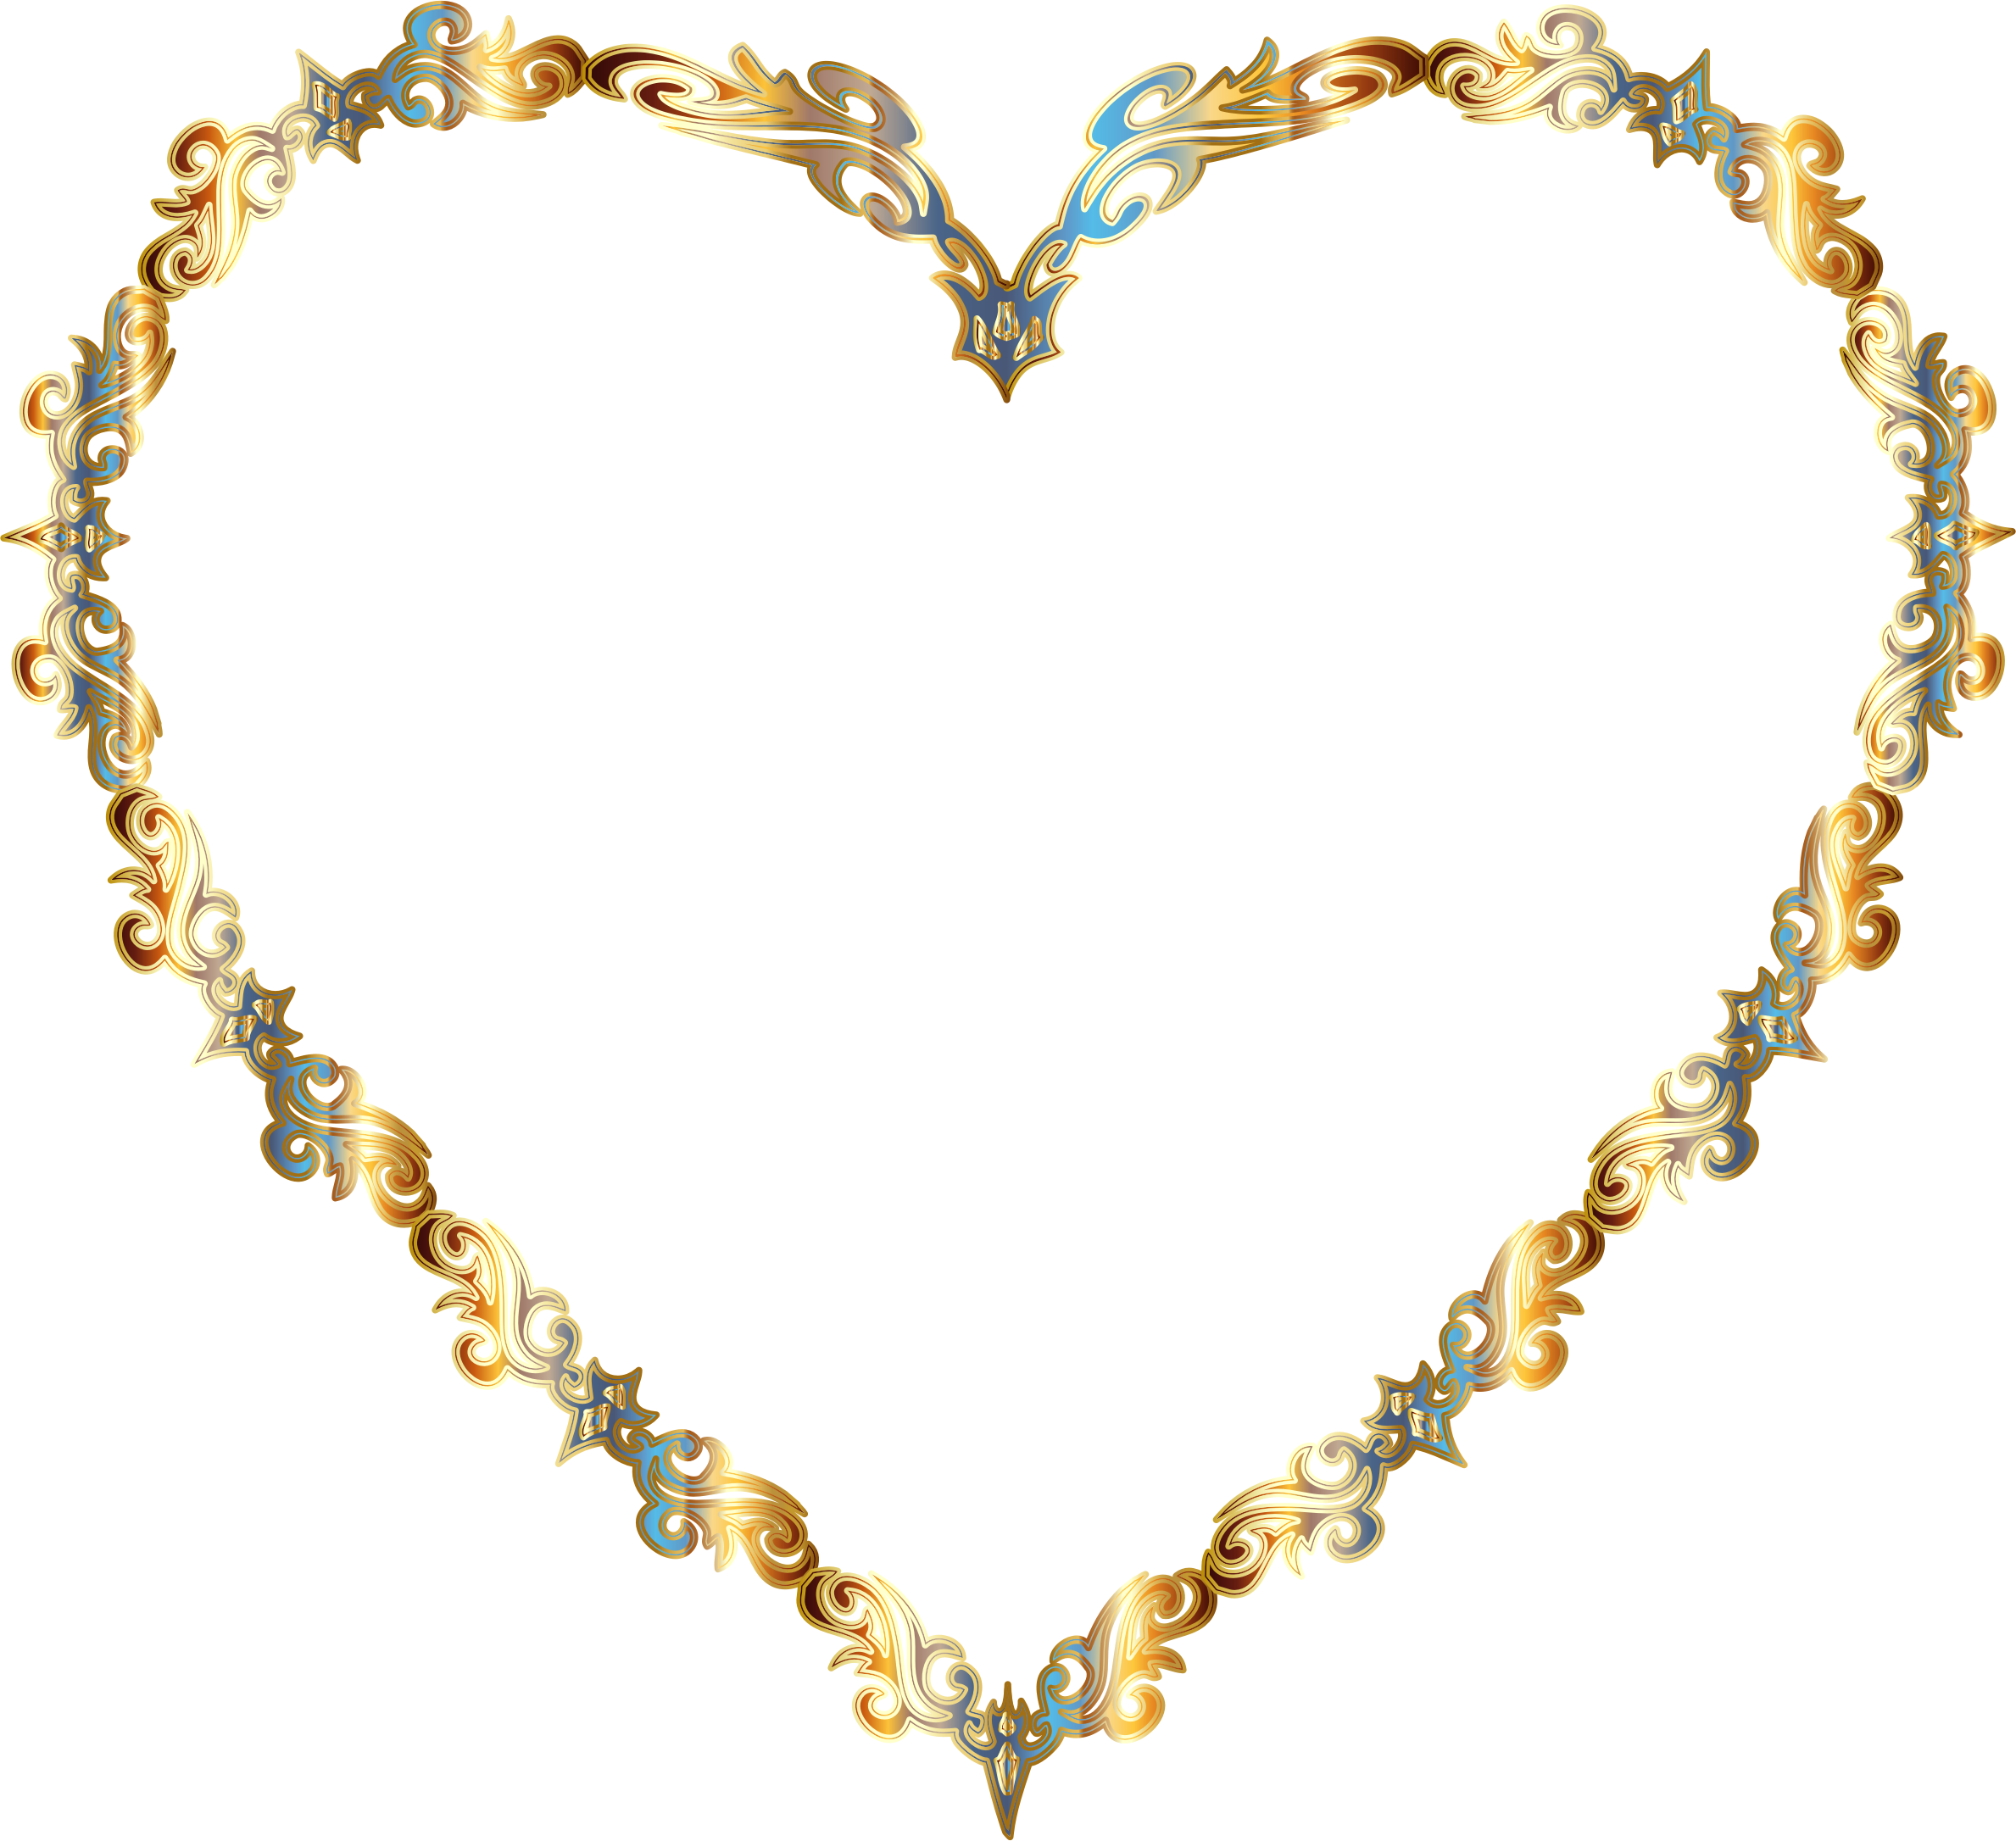 Heart chain clipart jpg freeuse download fancy necklace clipart - Clipground jpg freeuse download